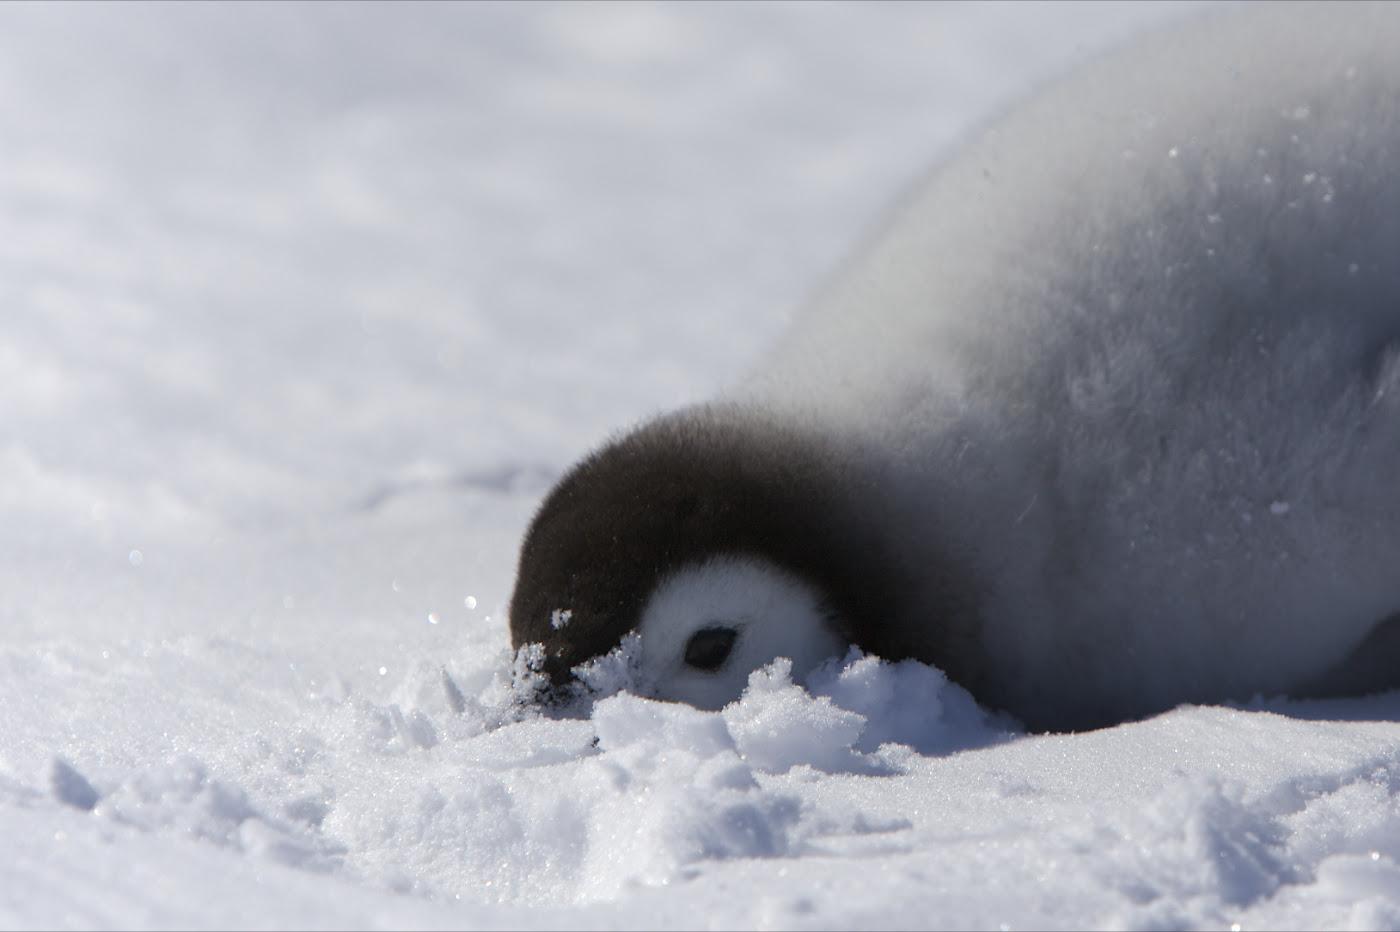 http://upload.wikimedia.org/wikipedia/commons/1/1a/Aptenodytes_forsteri_-Snow_Hill_Island%2C_Antarctica_-juvenile-8b.jpg